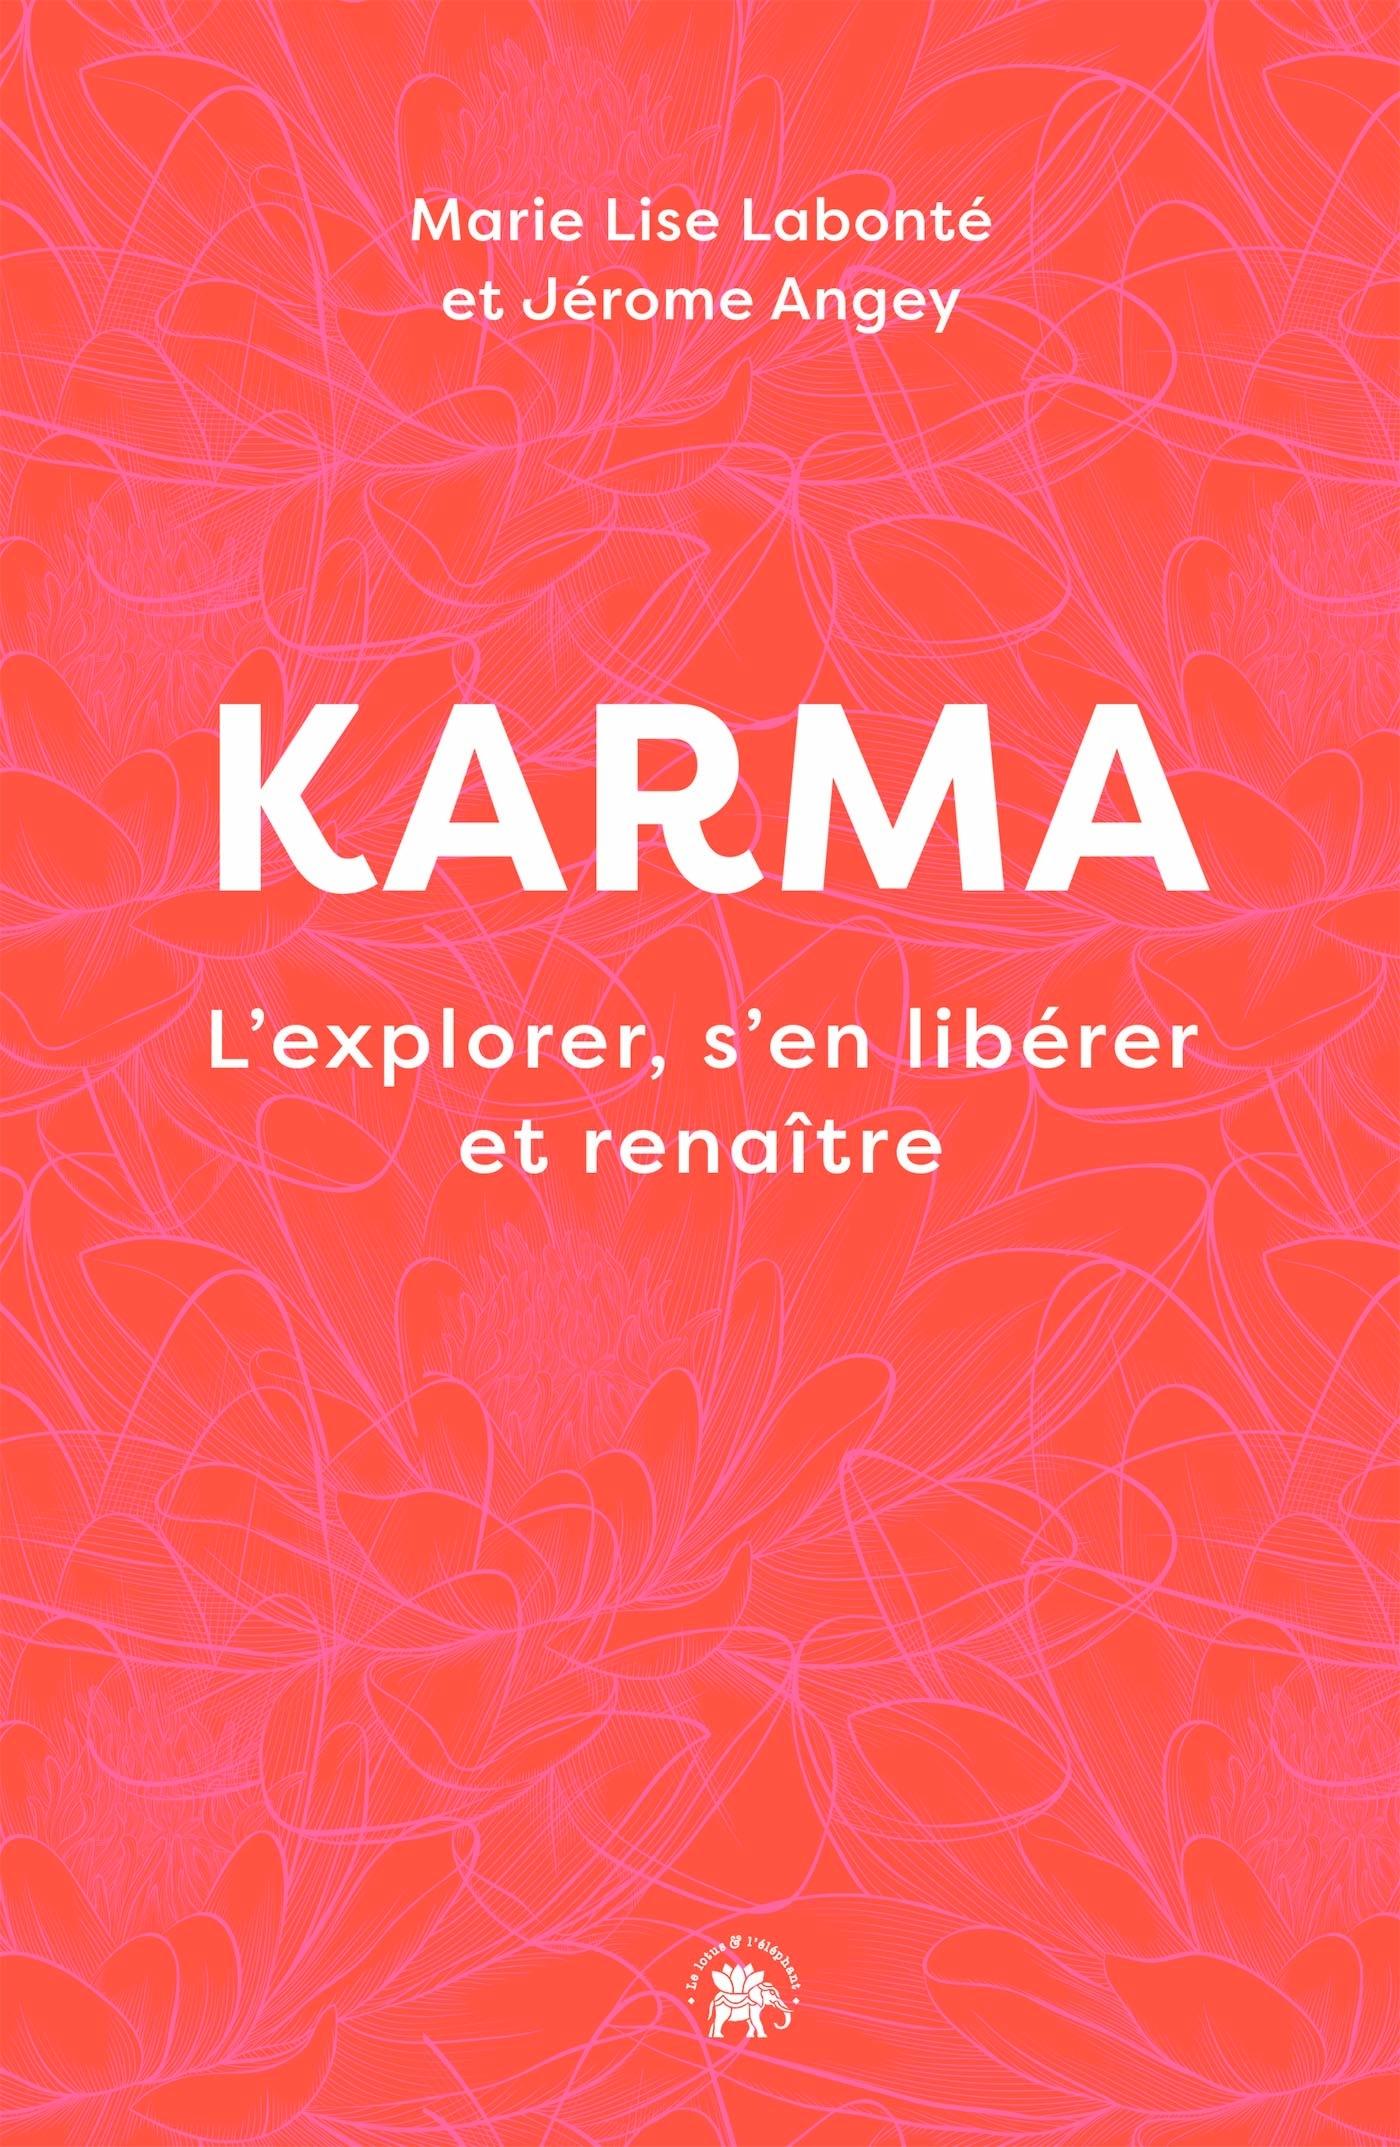 KARMA - L'EXPLORER, S'EN LIBERER ET RENAITRE